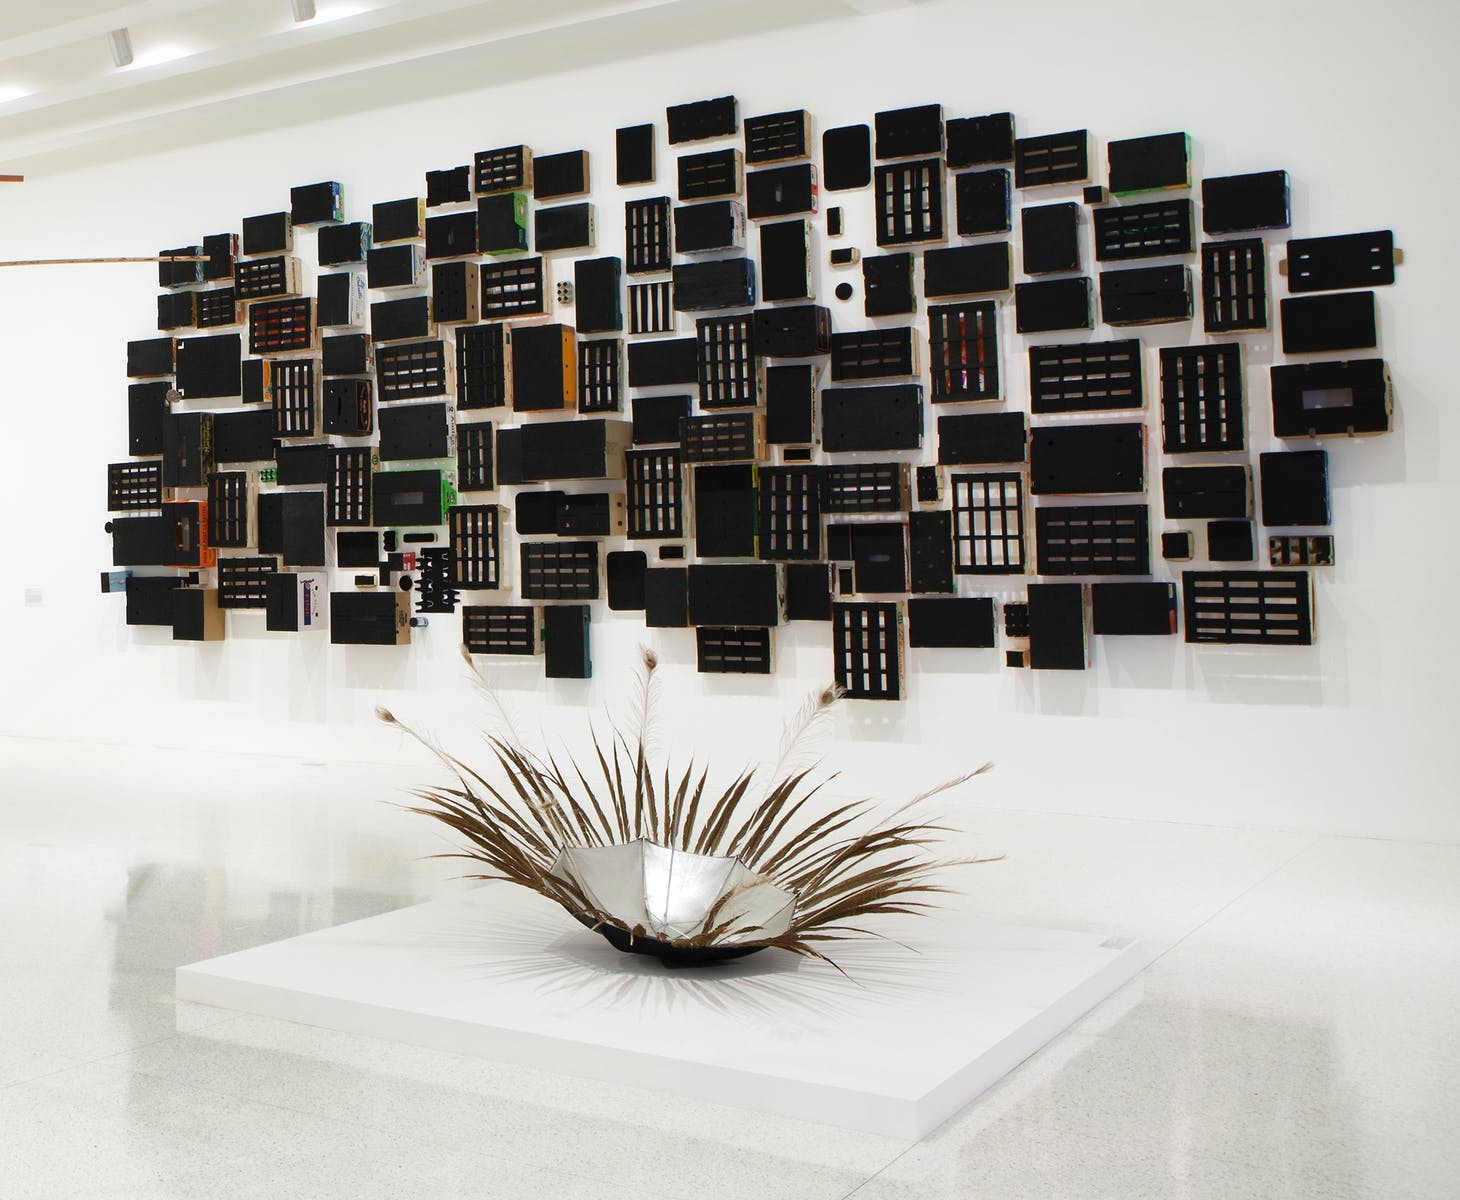 Installation view of the exhibition, Abraham Cruzvillegas: The Autoconstrucción Suites, 2013